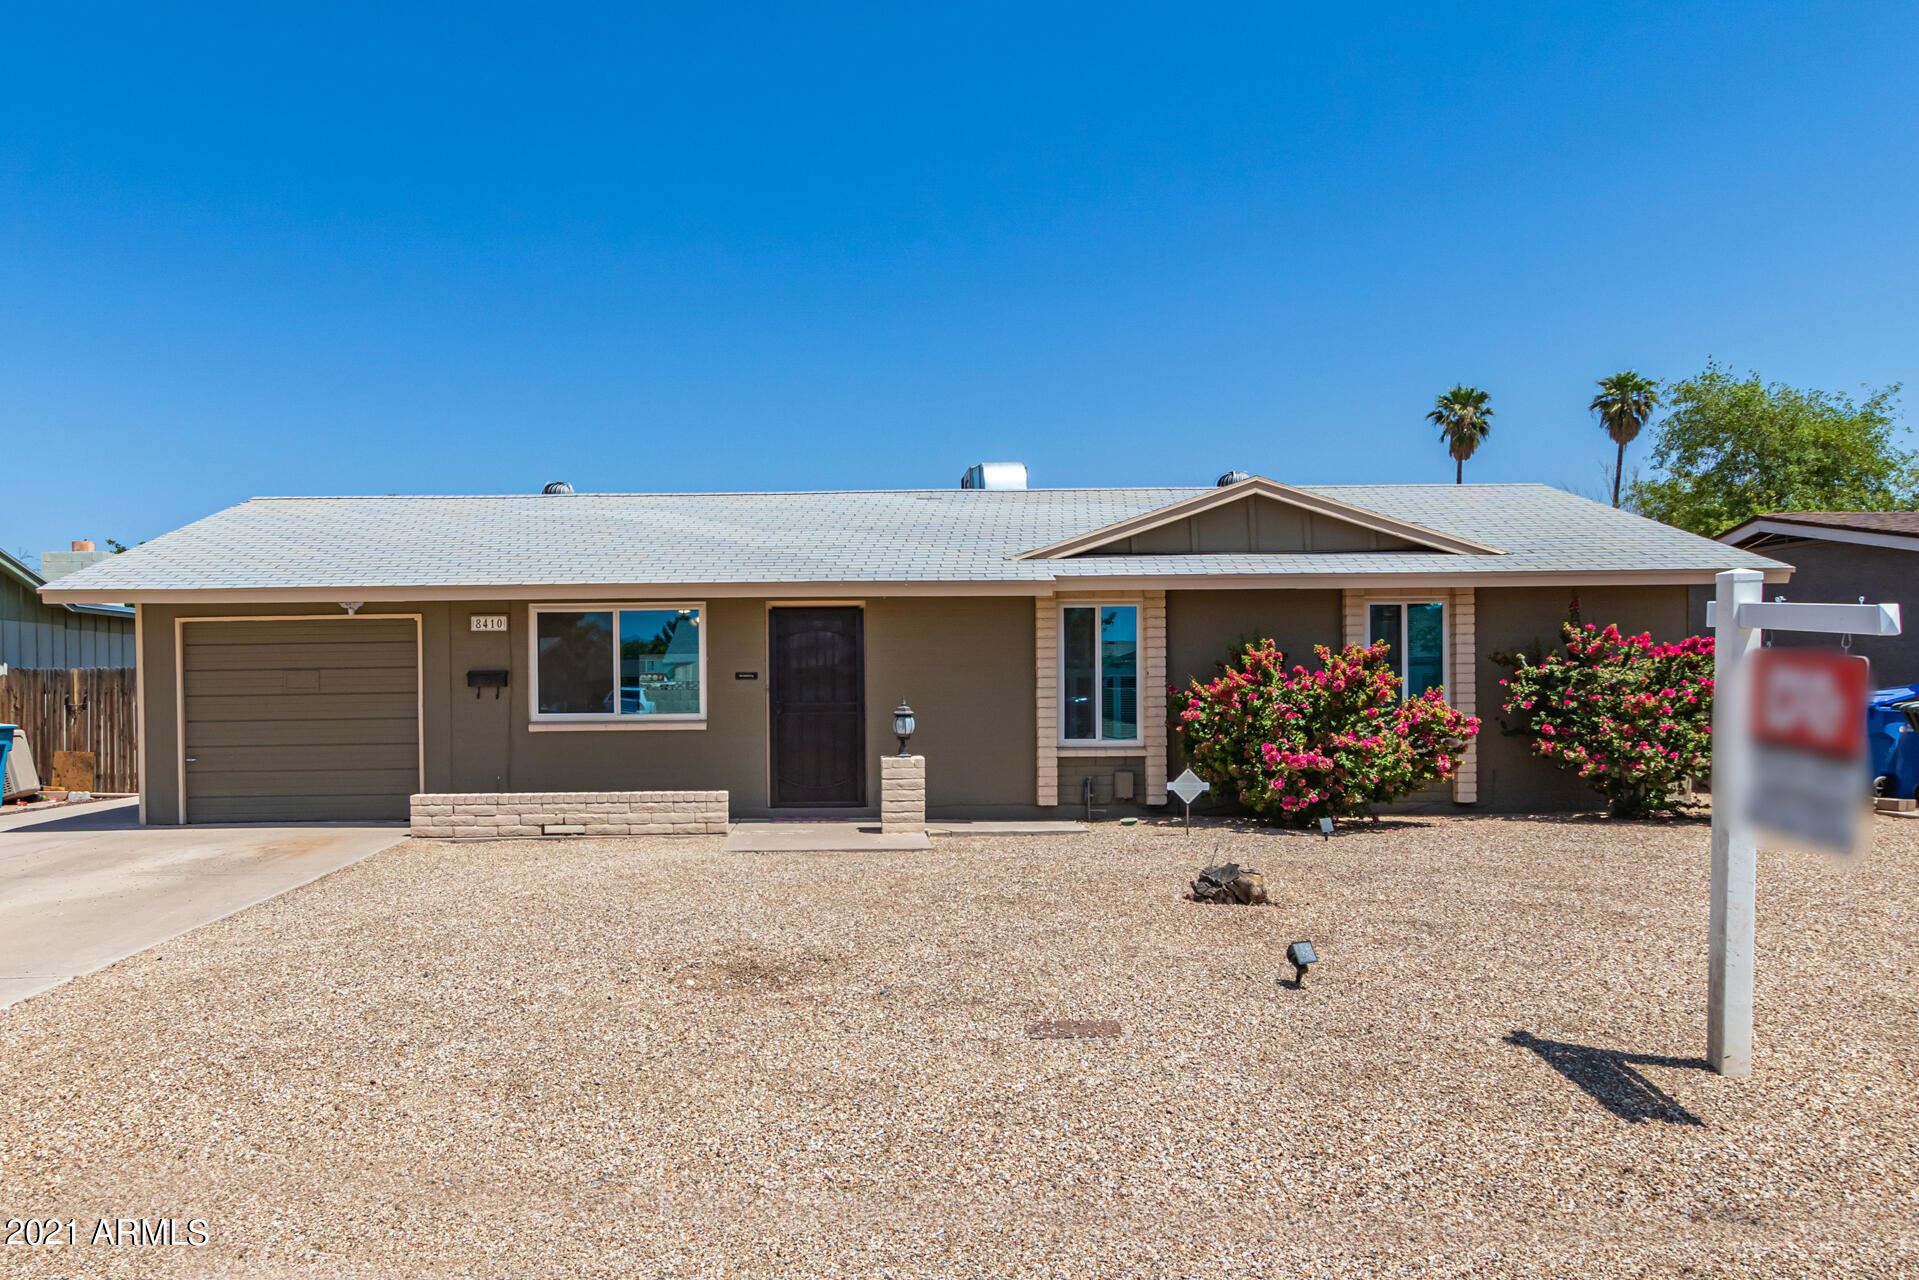 8410 W GLENROSA Avenue, Phoenix, AZ 85037 - MLS#: 6233918